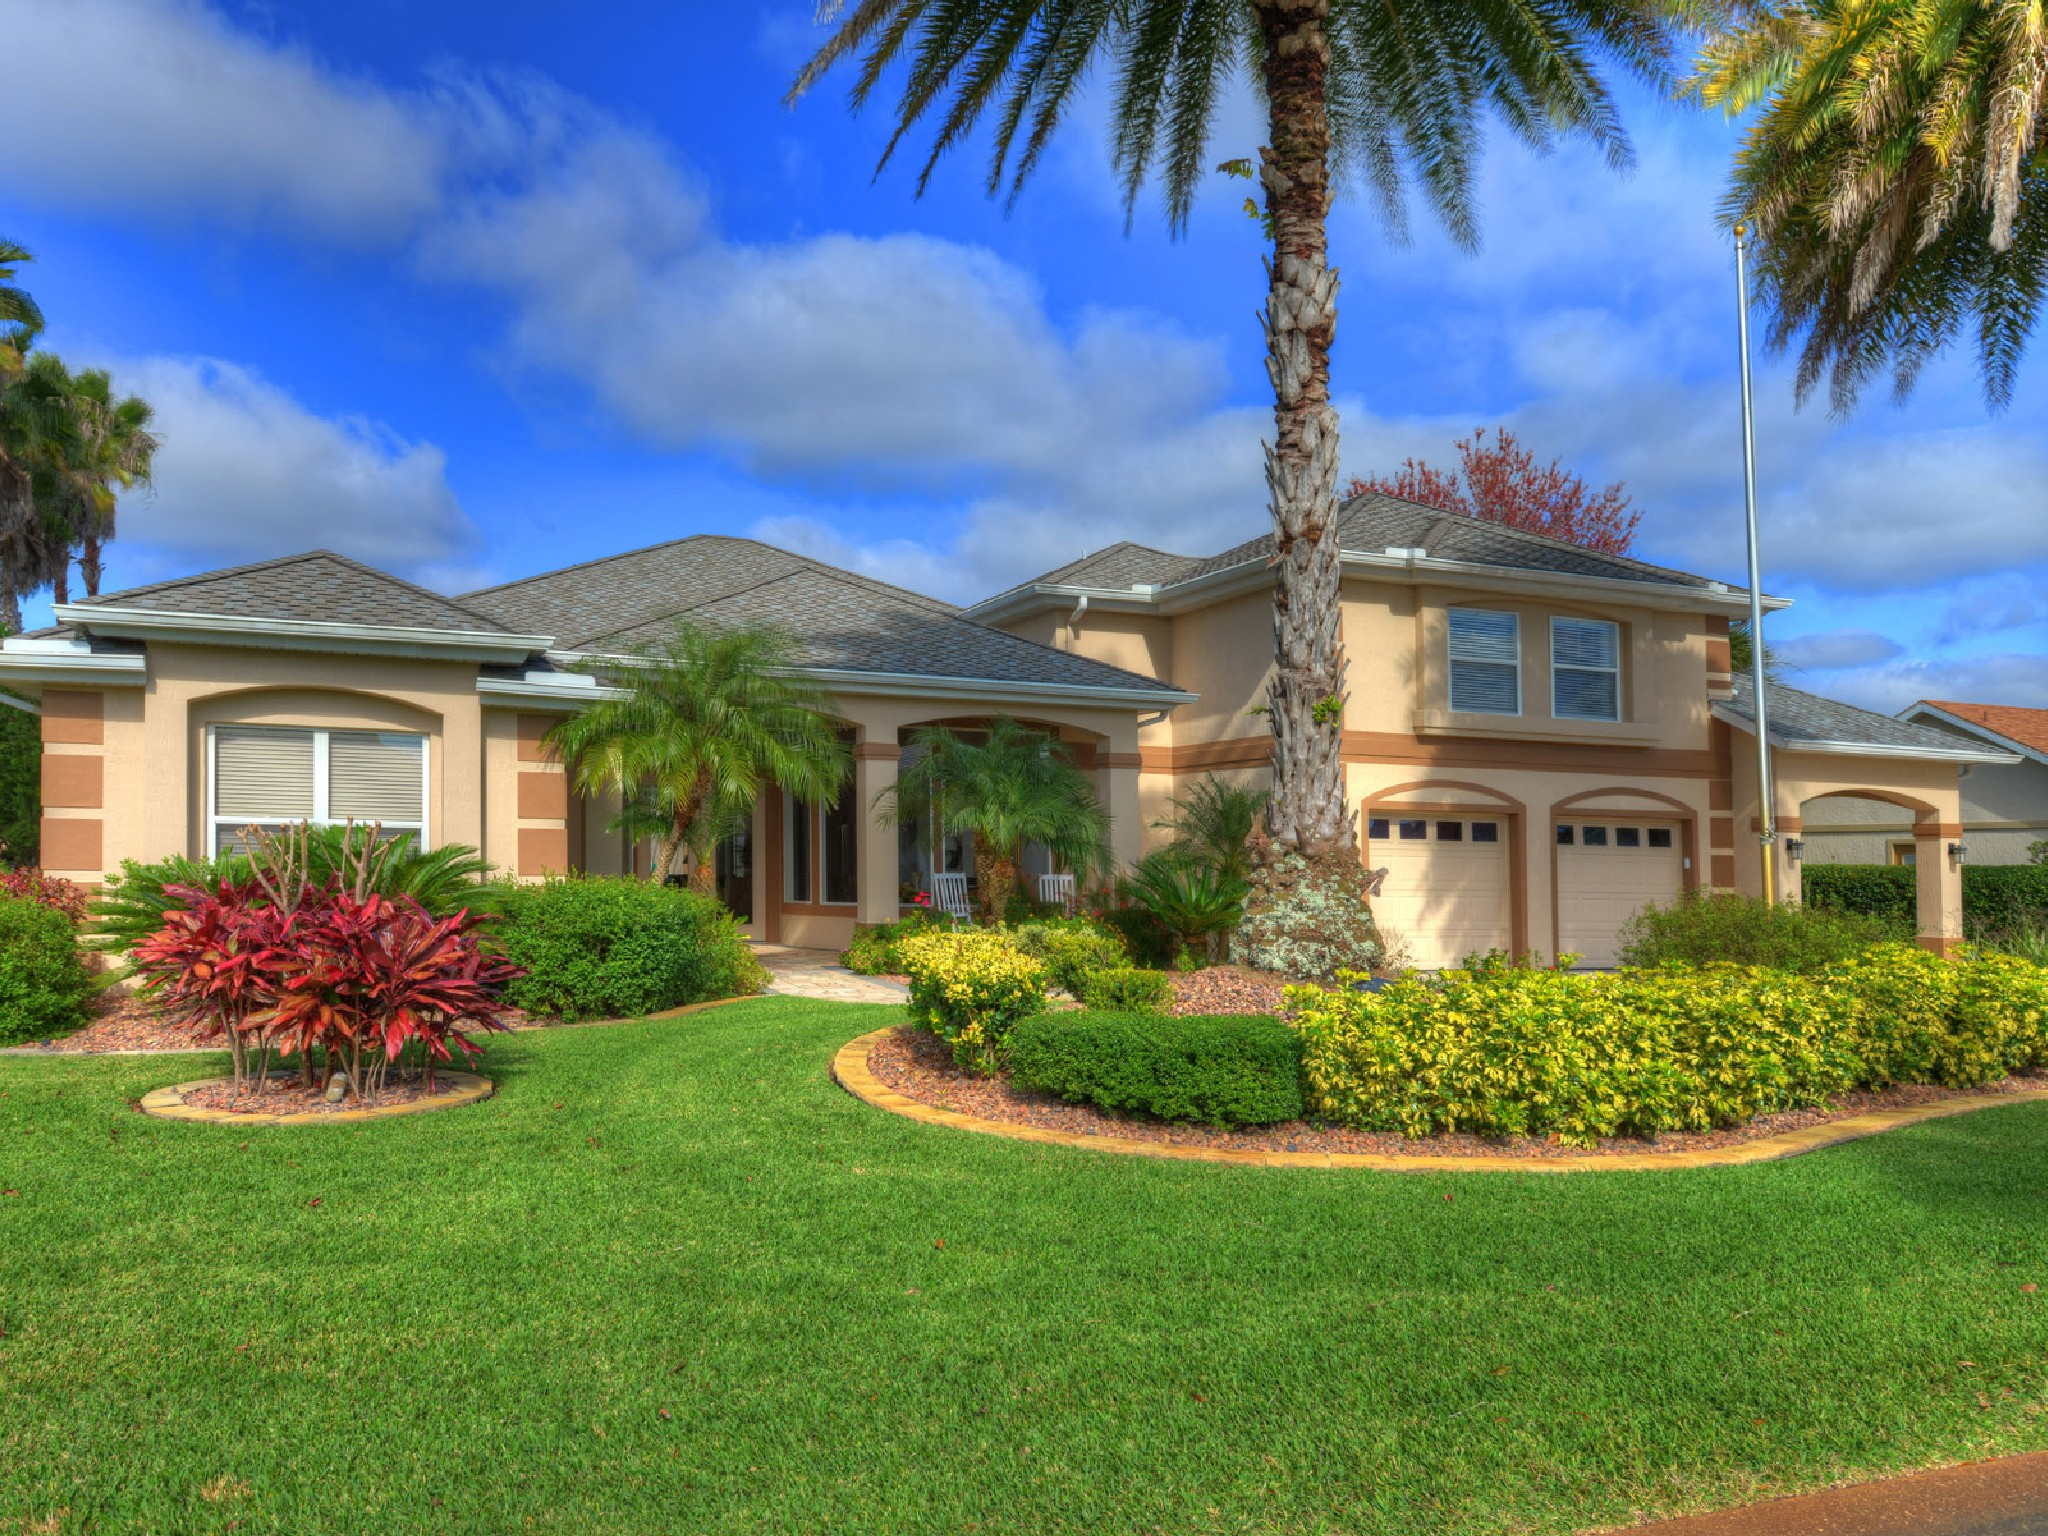 Single Family Home for Sale at Daytona Beach, Florida 2895 Borman Court Port Orange, Florida 32128 United States